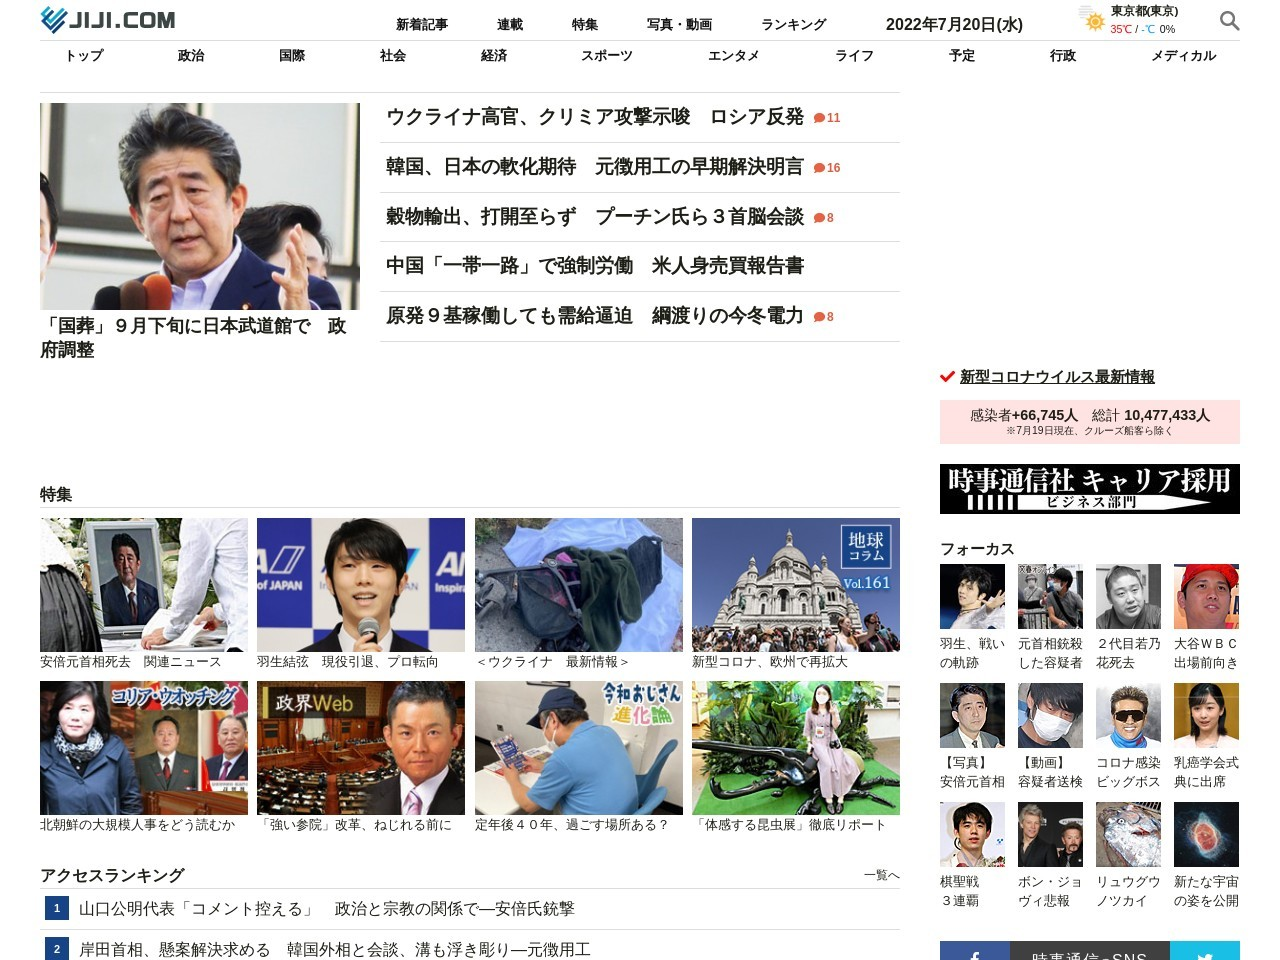 webサイト「ザテレビジョン」の【視聴熱】2/26-3/4ウィークリーランキング ラジオ特番も放送された「アン …